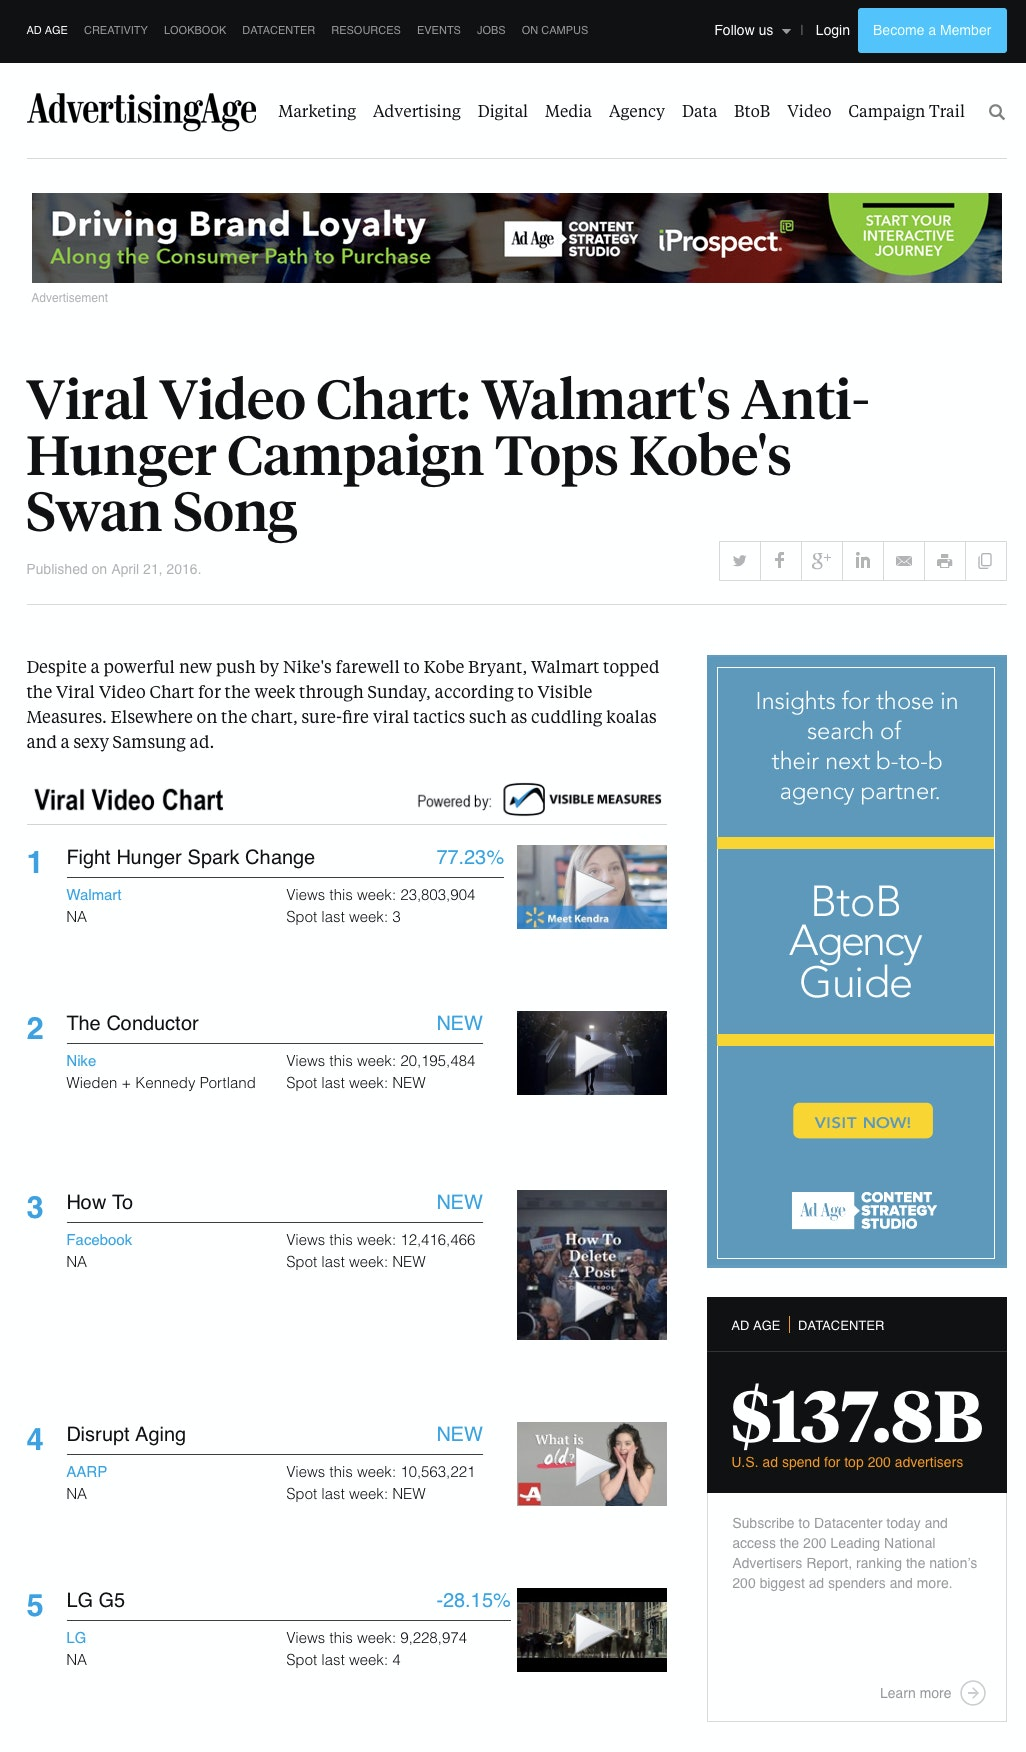 My Walmart film tops Viral Video Chart